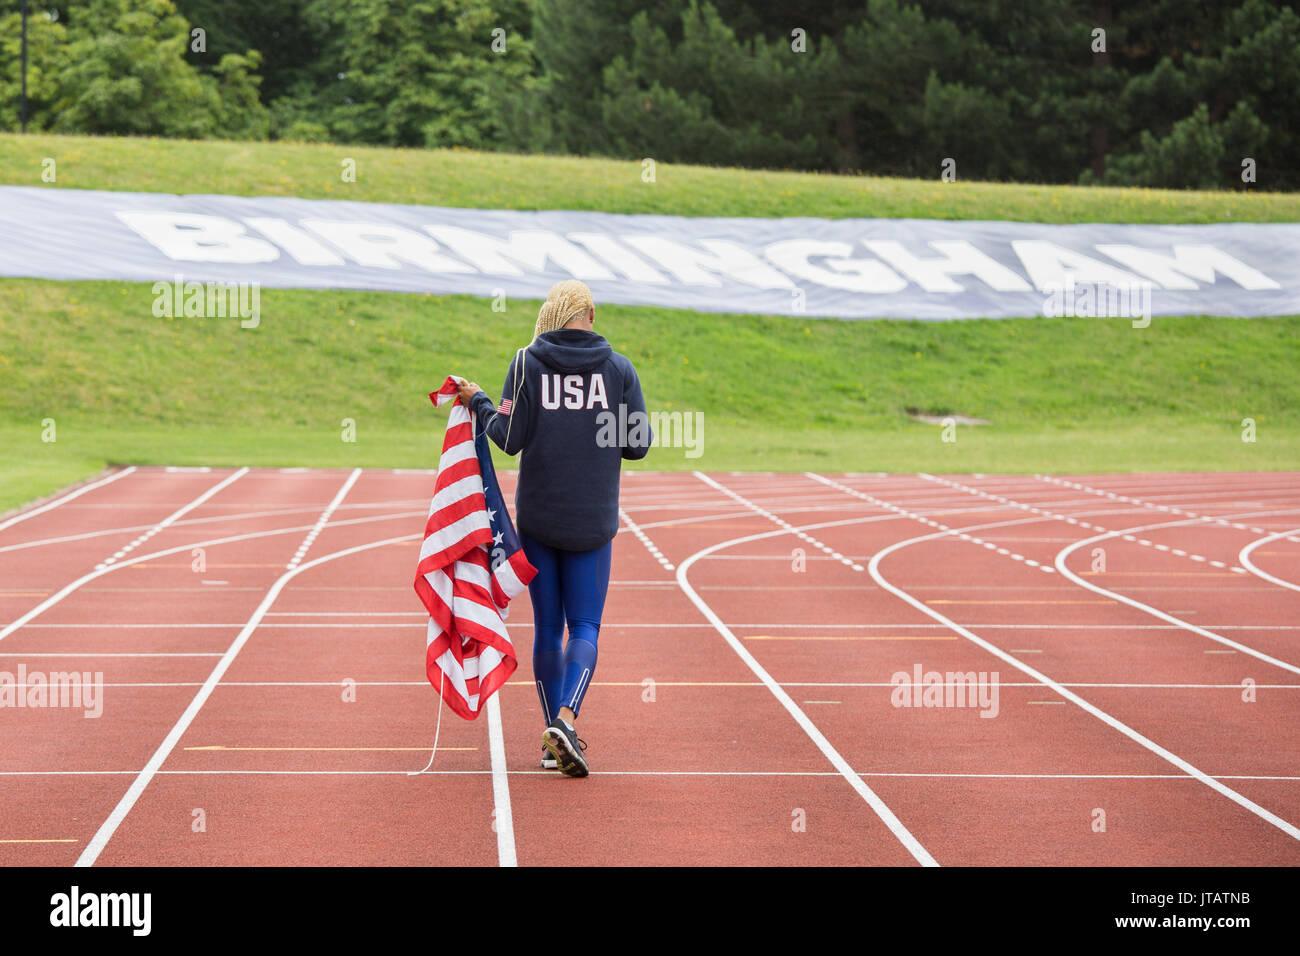 USA athlete sprinter Natasha Hastings at the Alexander Stadium in Birmingham,UK - Stock Image